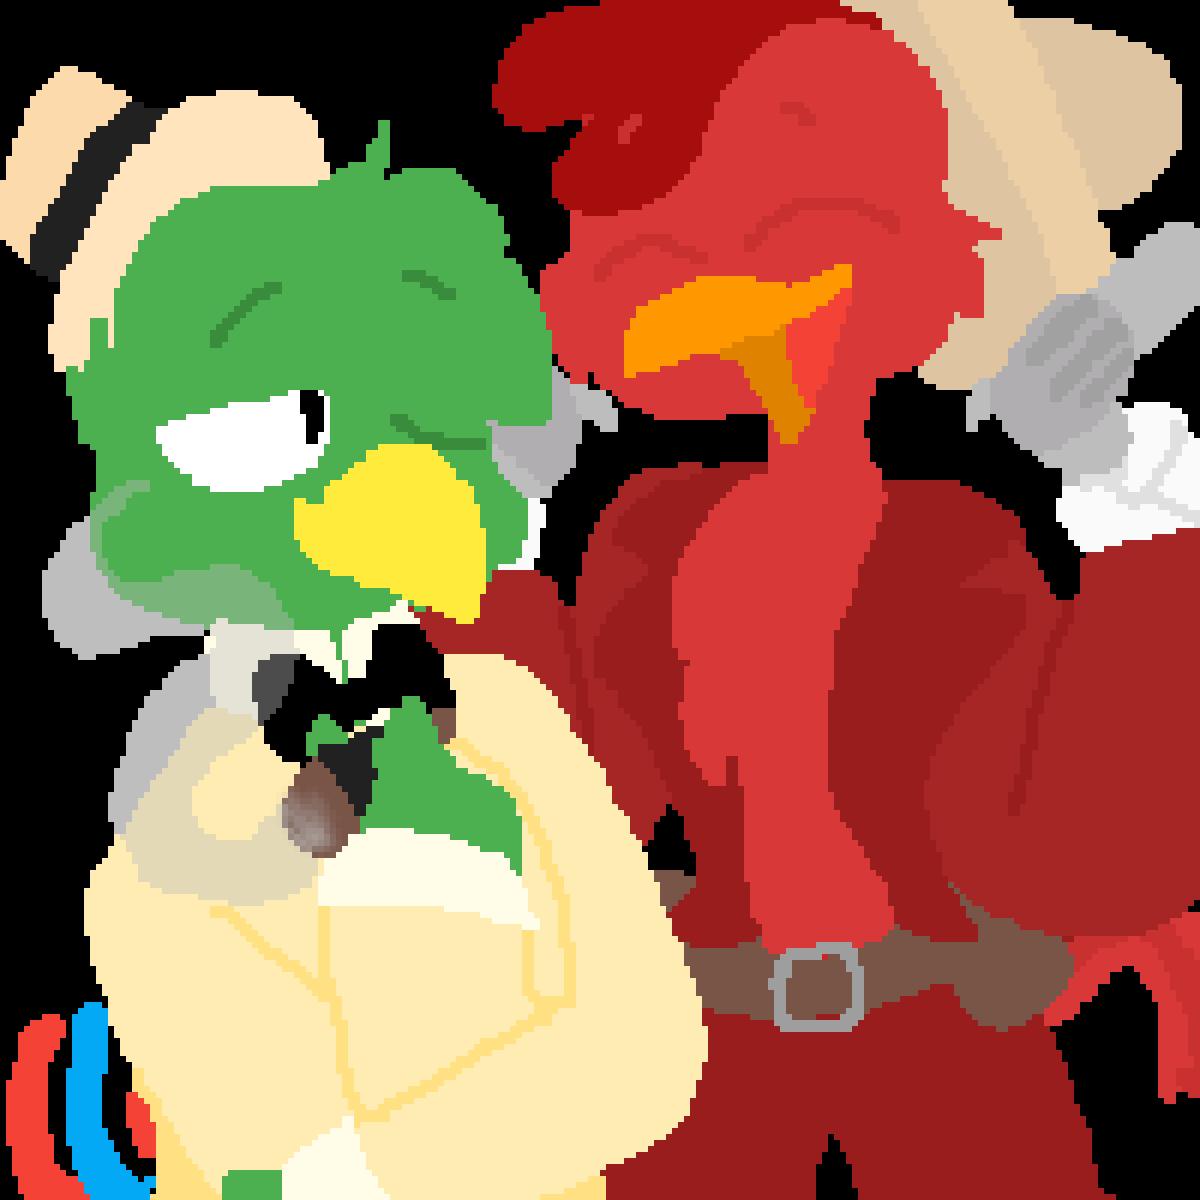 main-image-Jose Carioca and Panchito Pistoles  by Just-Jenn